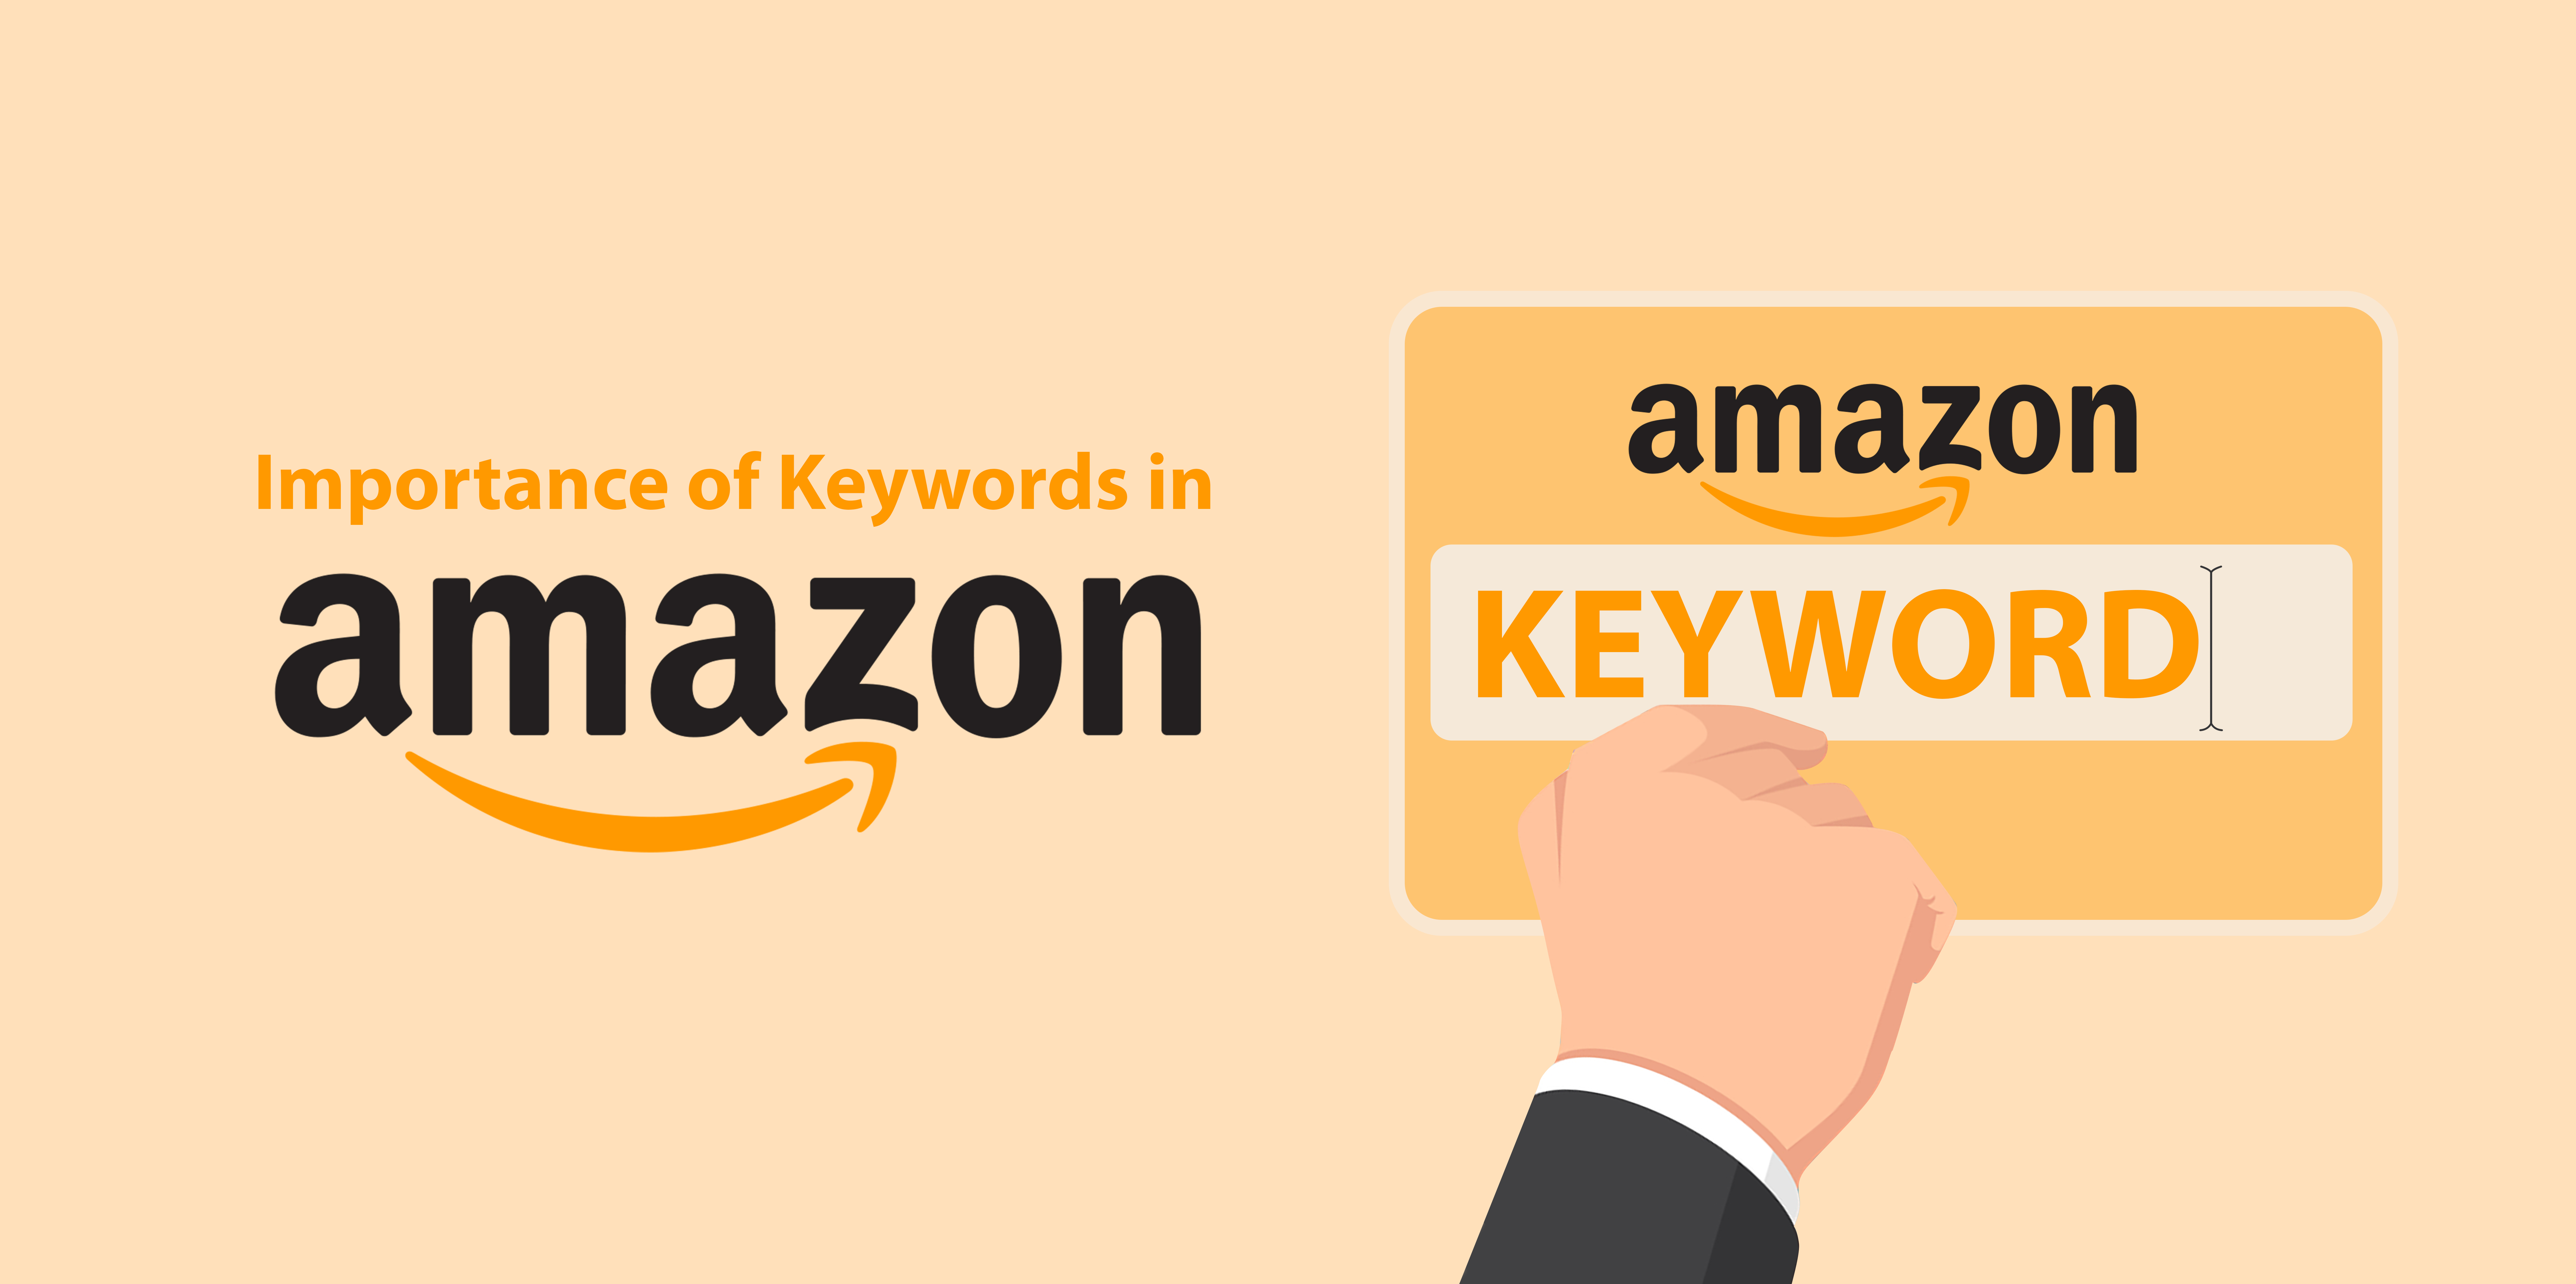 keywords on amazon